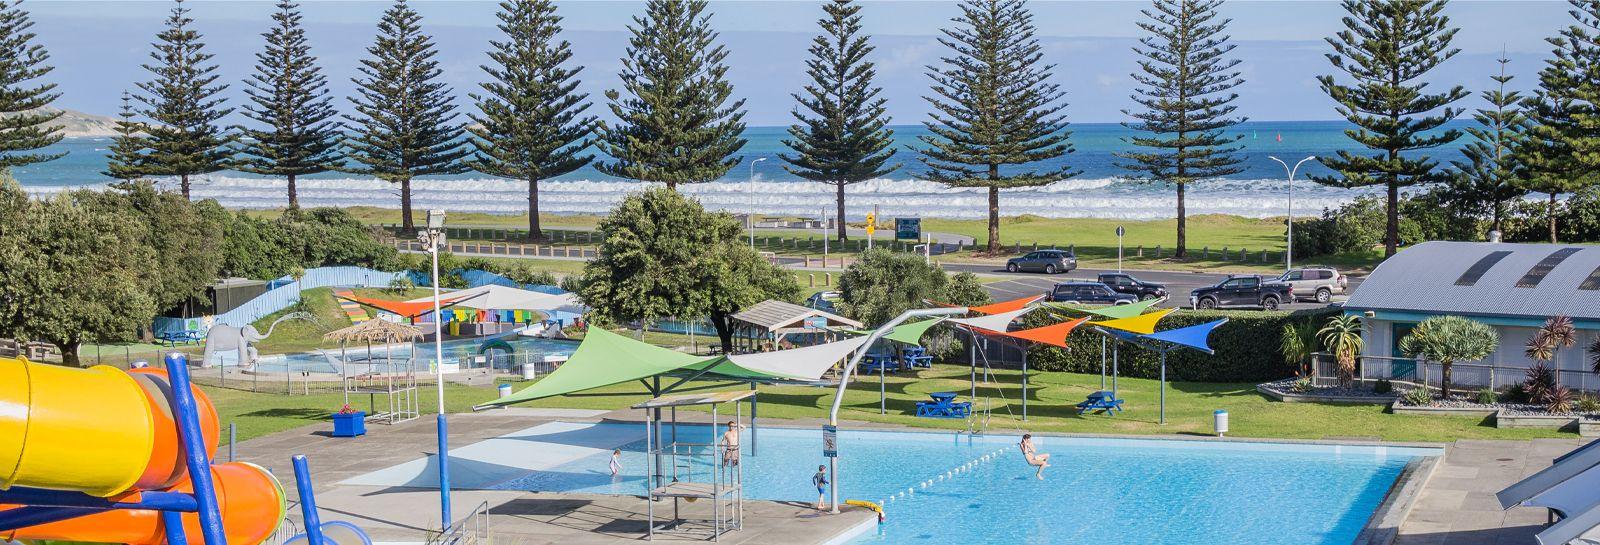 Pool banner image